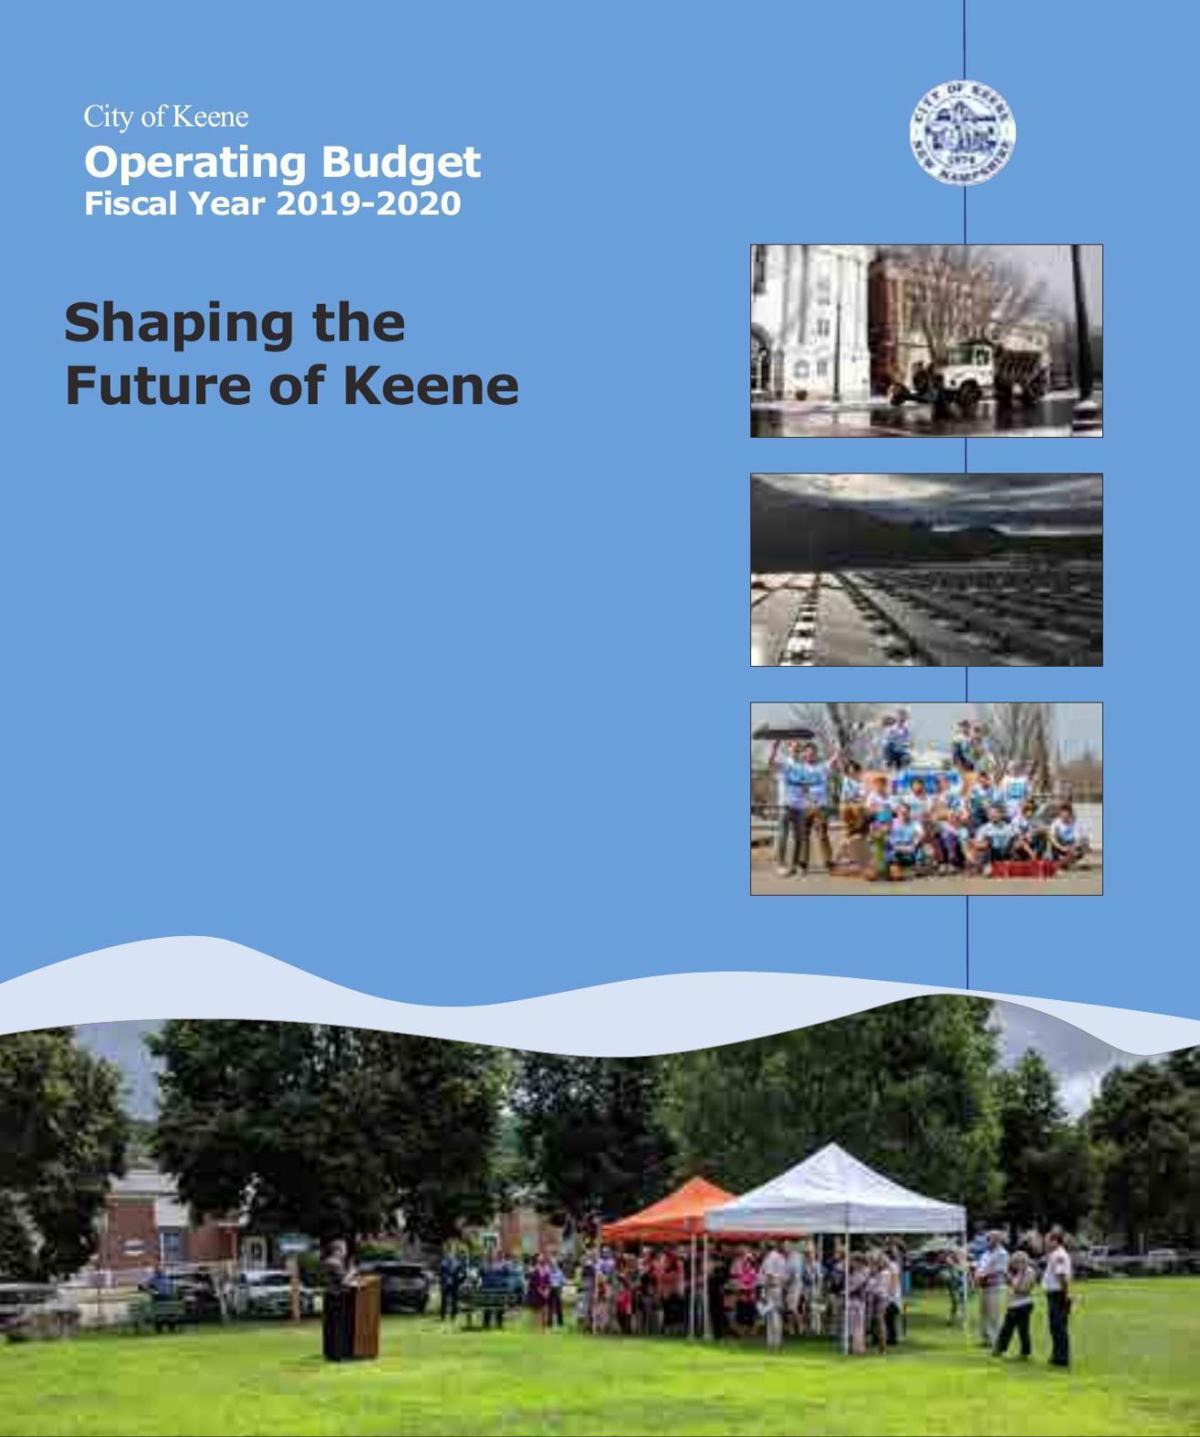 Keene Budget Proposal 2019-20